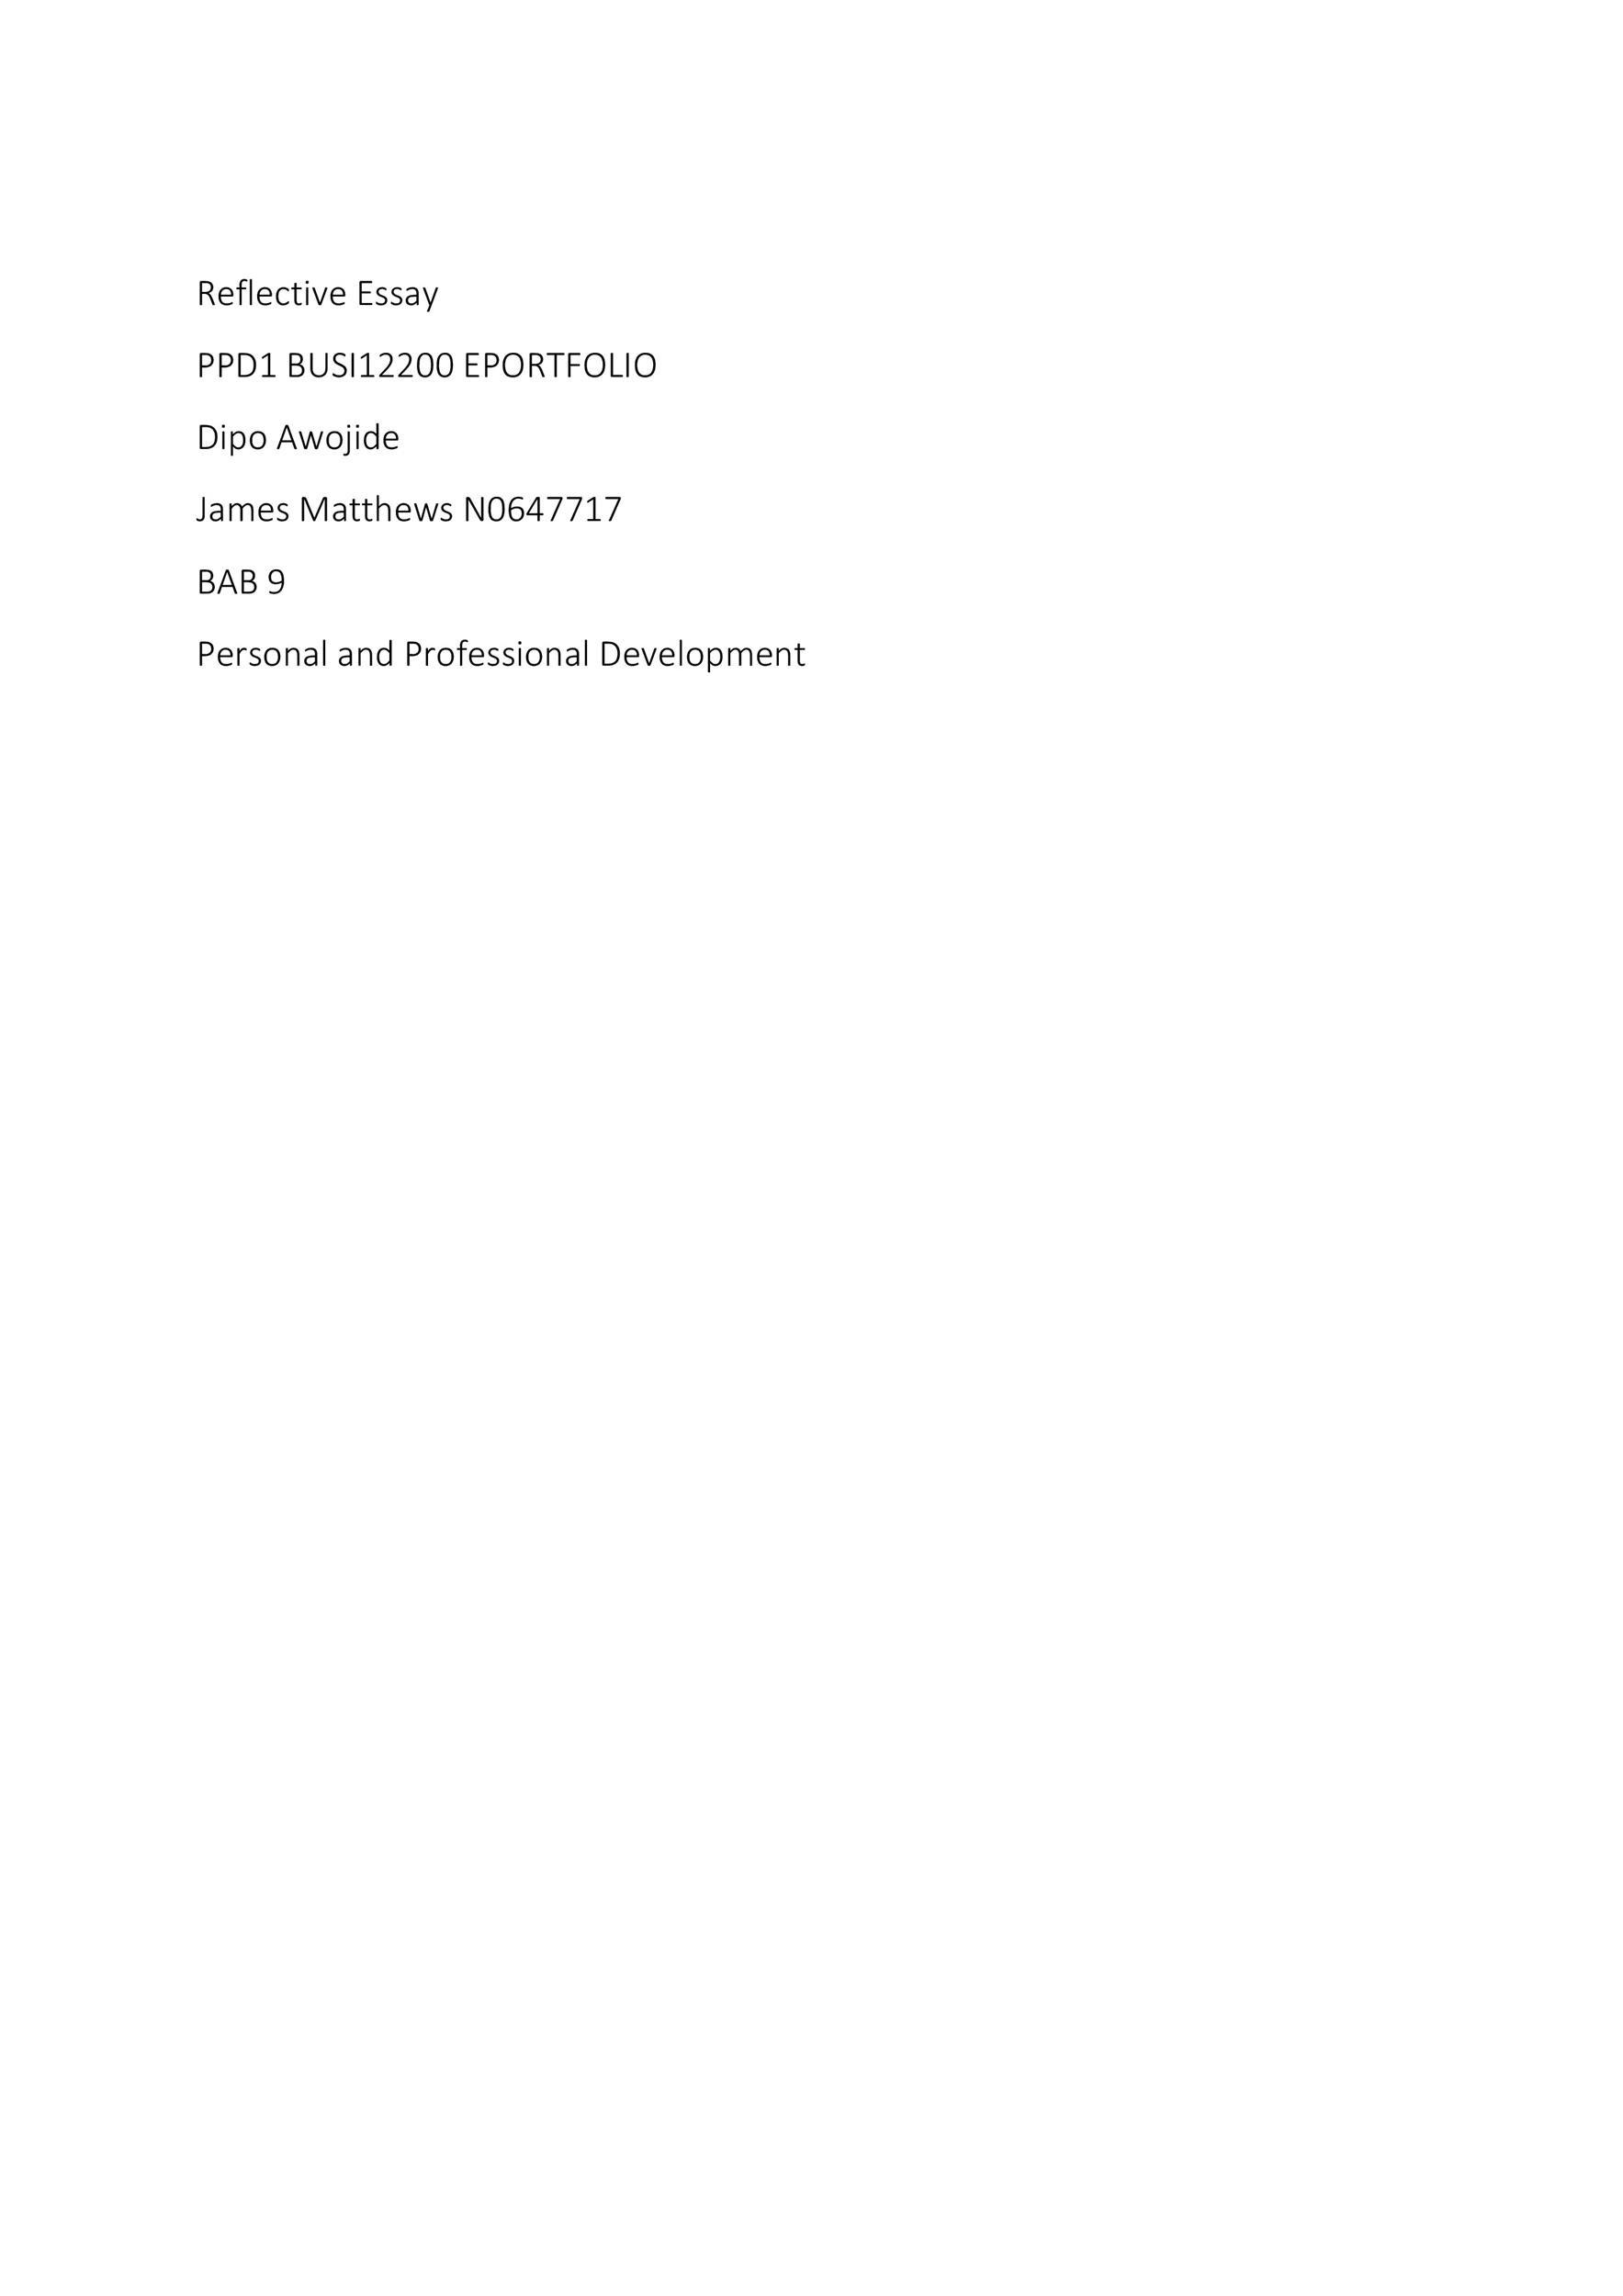 Free reflective essay example 26